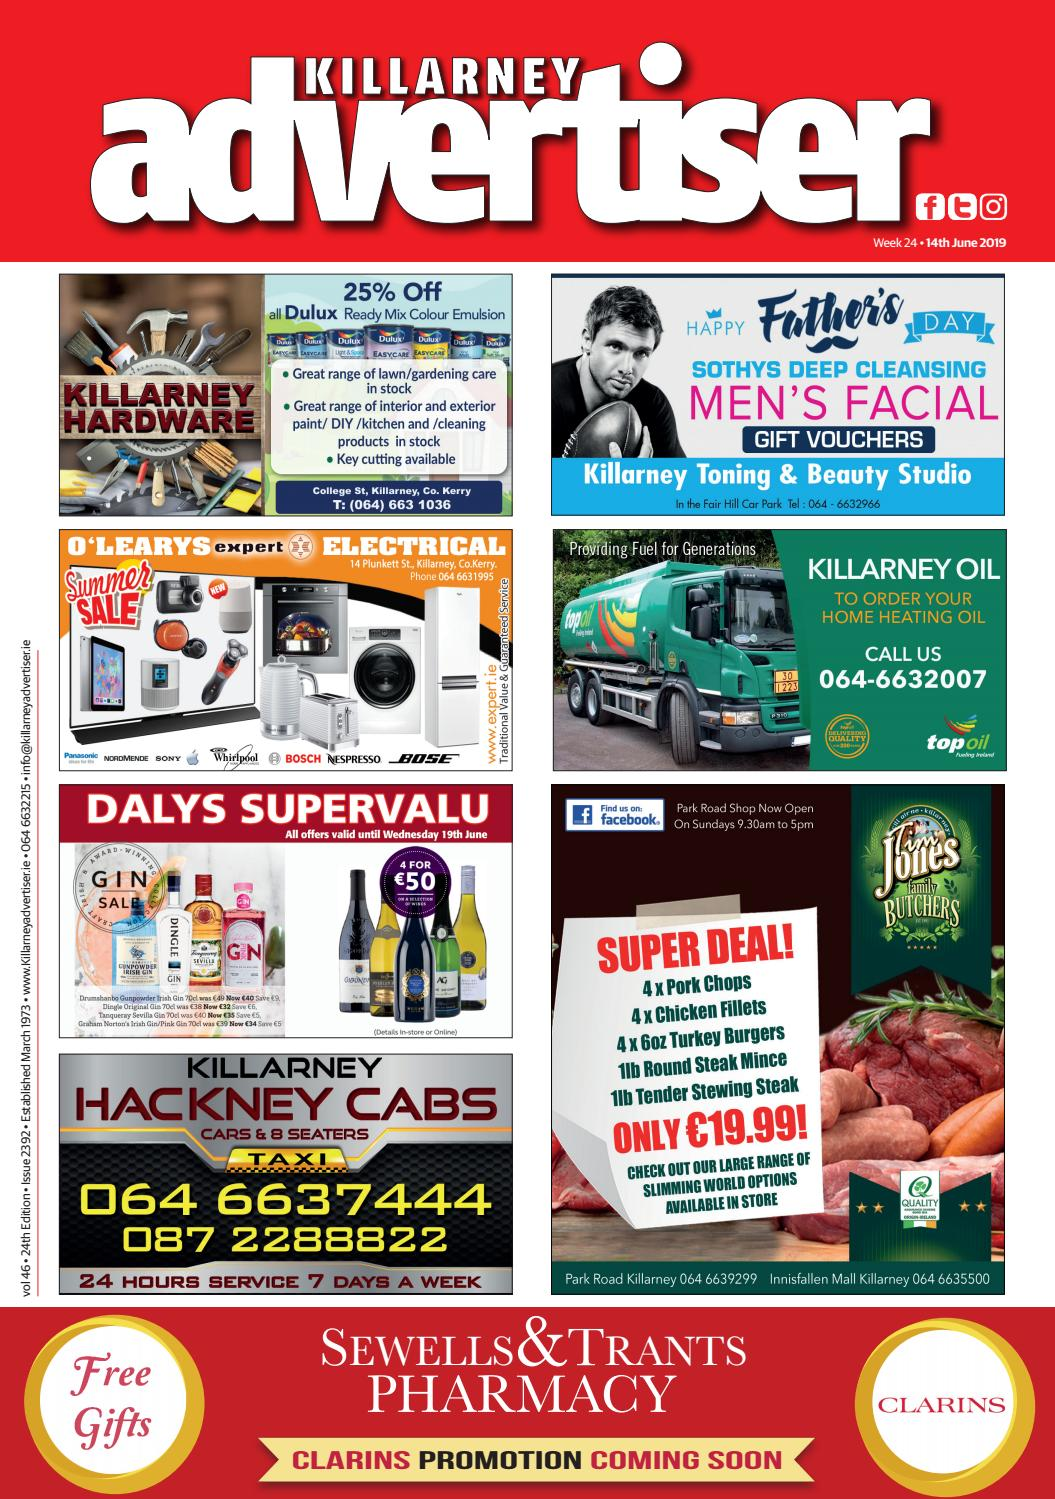 Killarney Dating Site, 100% Free Online Dating in Killarney, CK